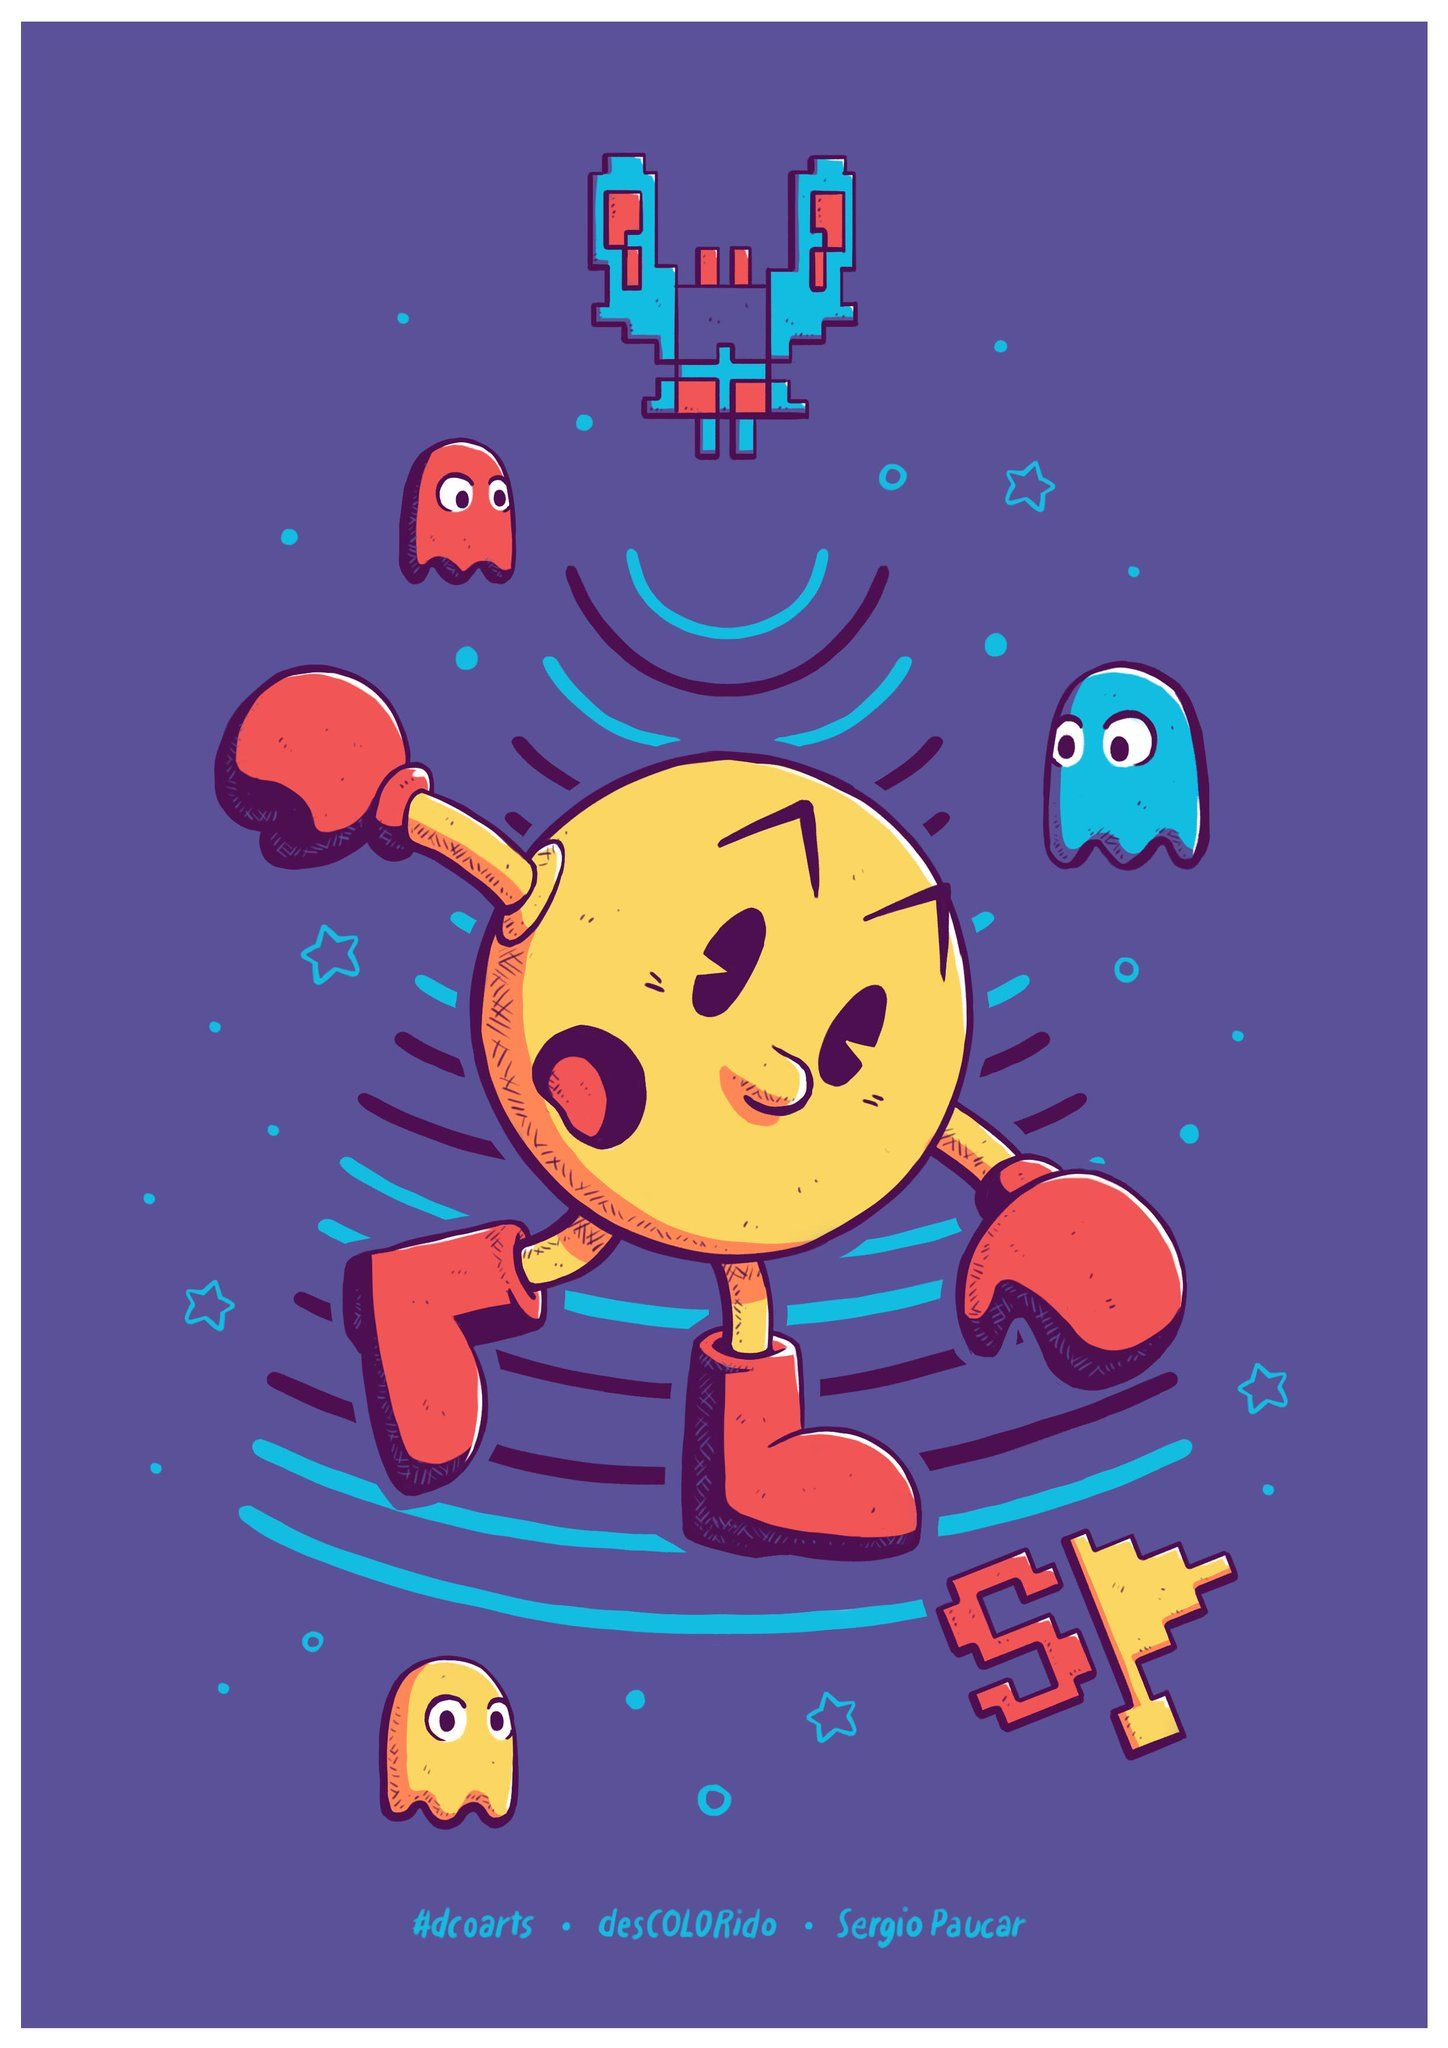 f8b13392890 Fanart de Pac-man por desCOLORido (Sergio Paucar) (dcoarts ...